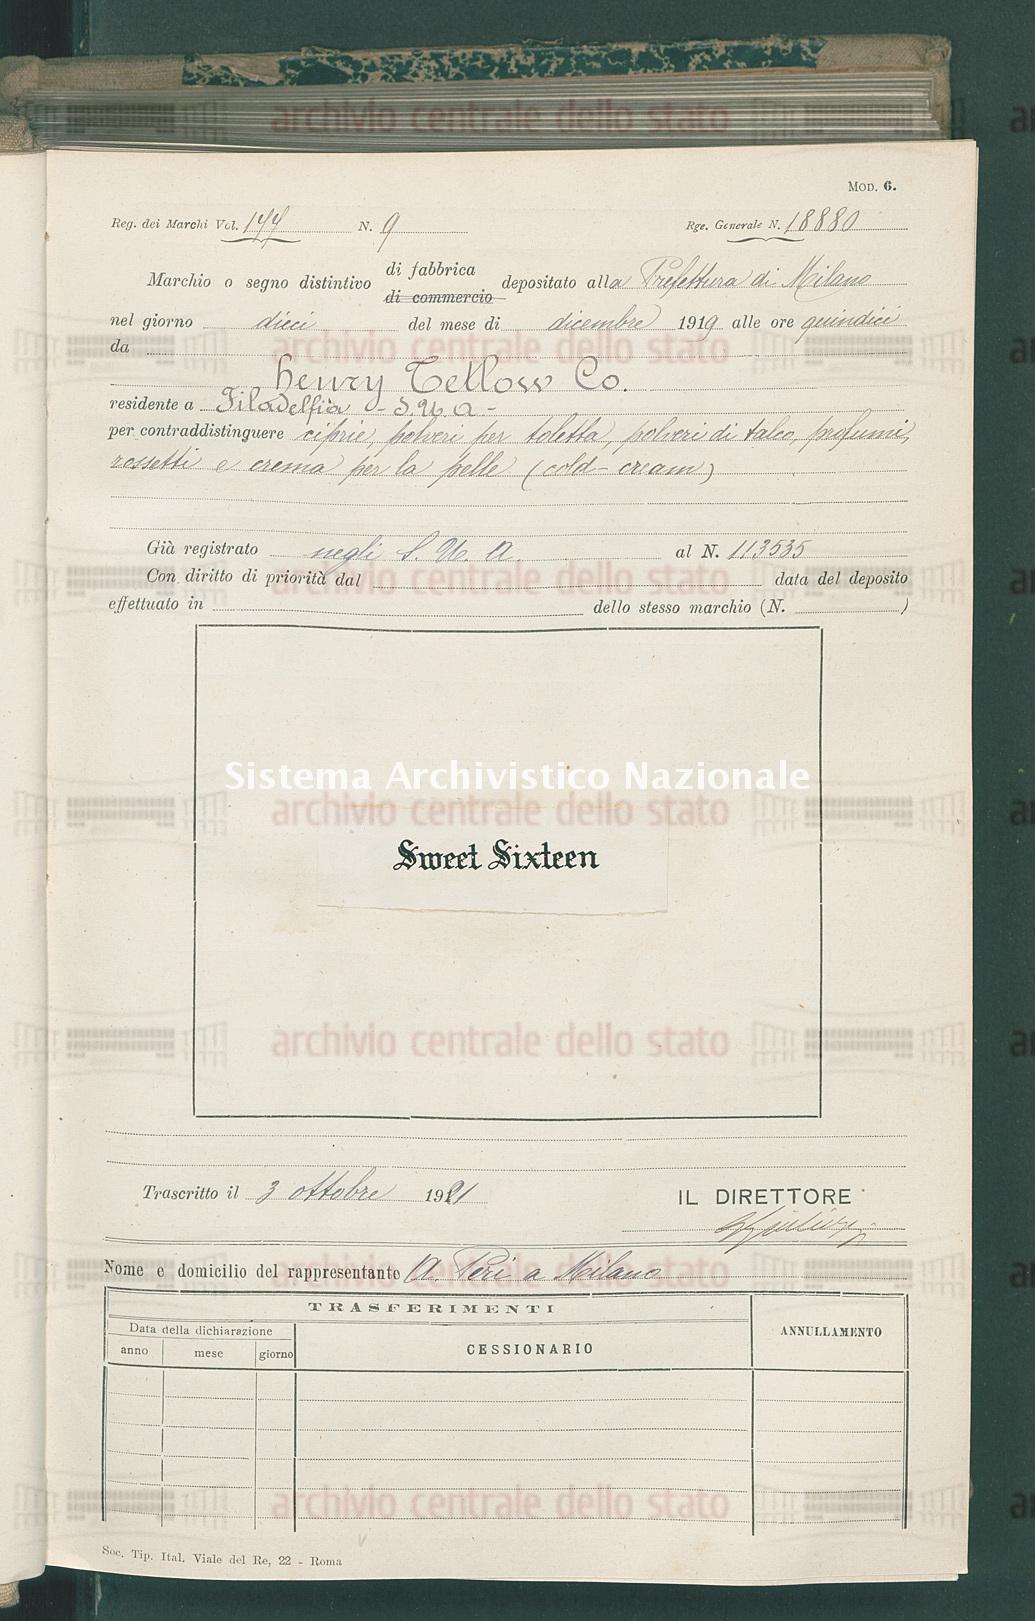 Henry Tetlow Co. (03/10/1921)